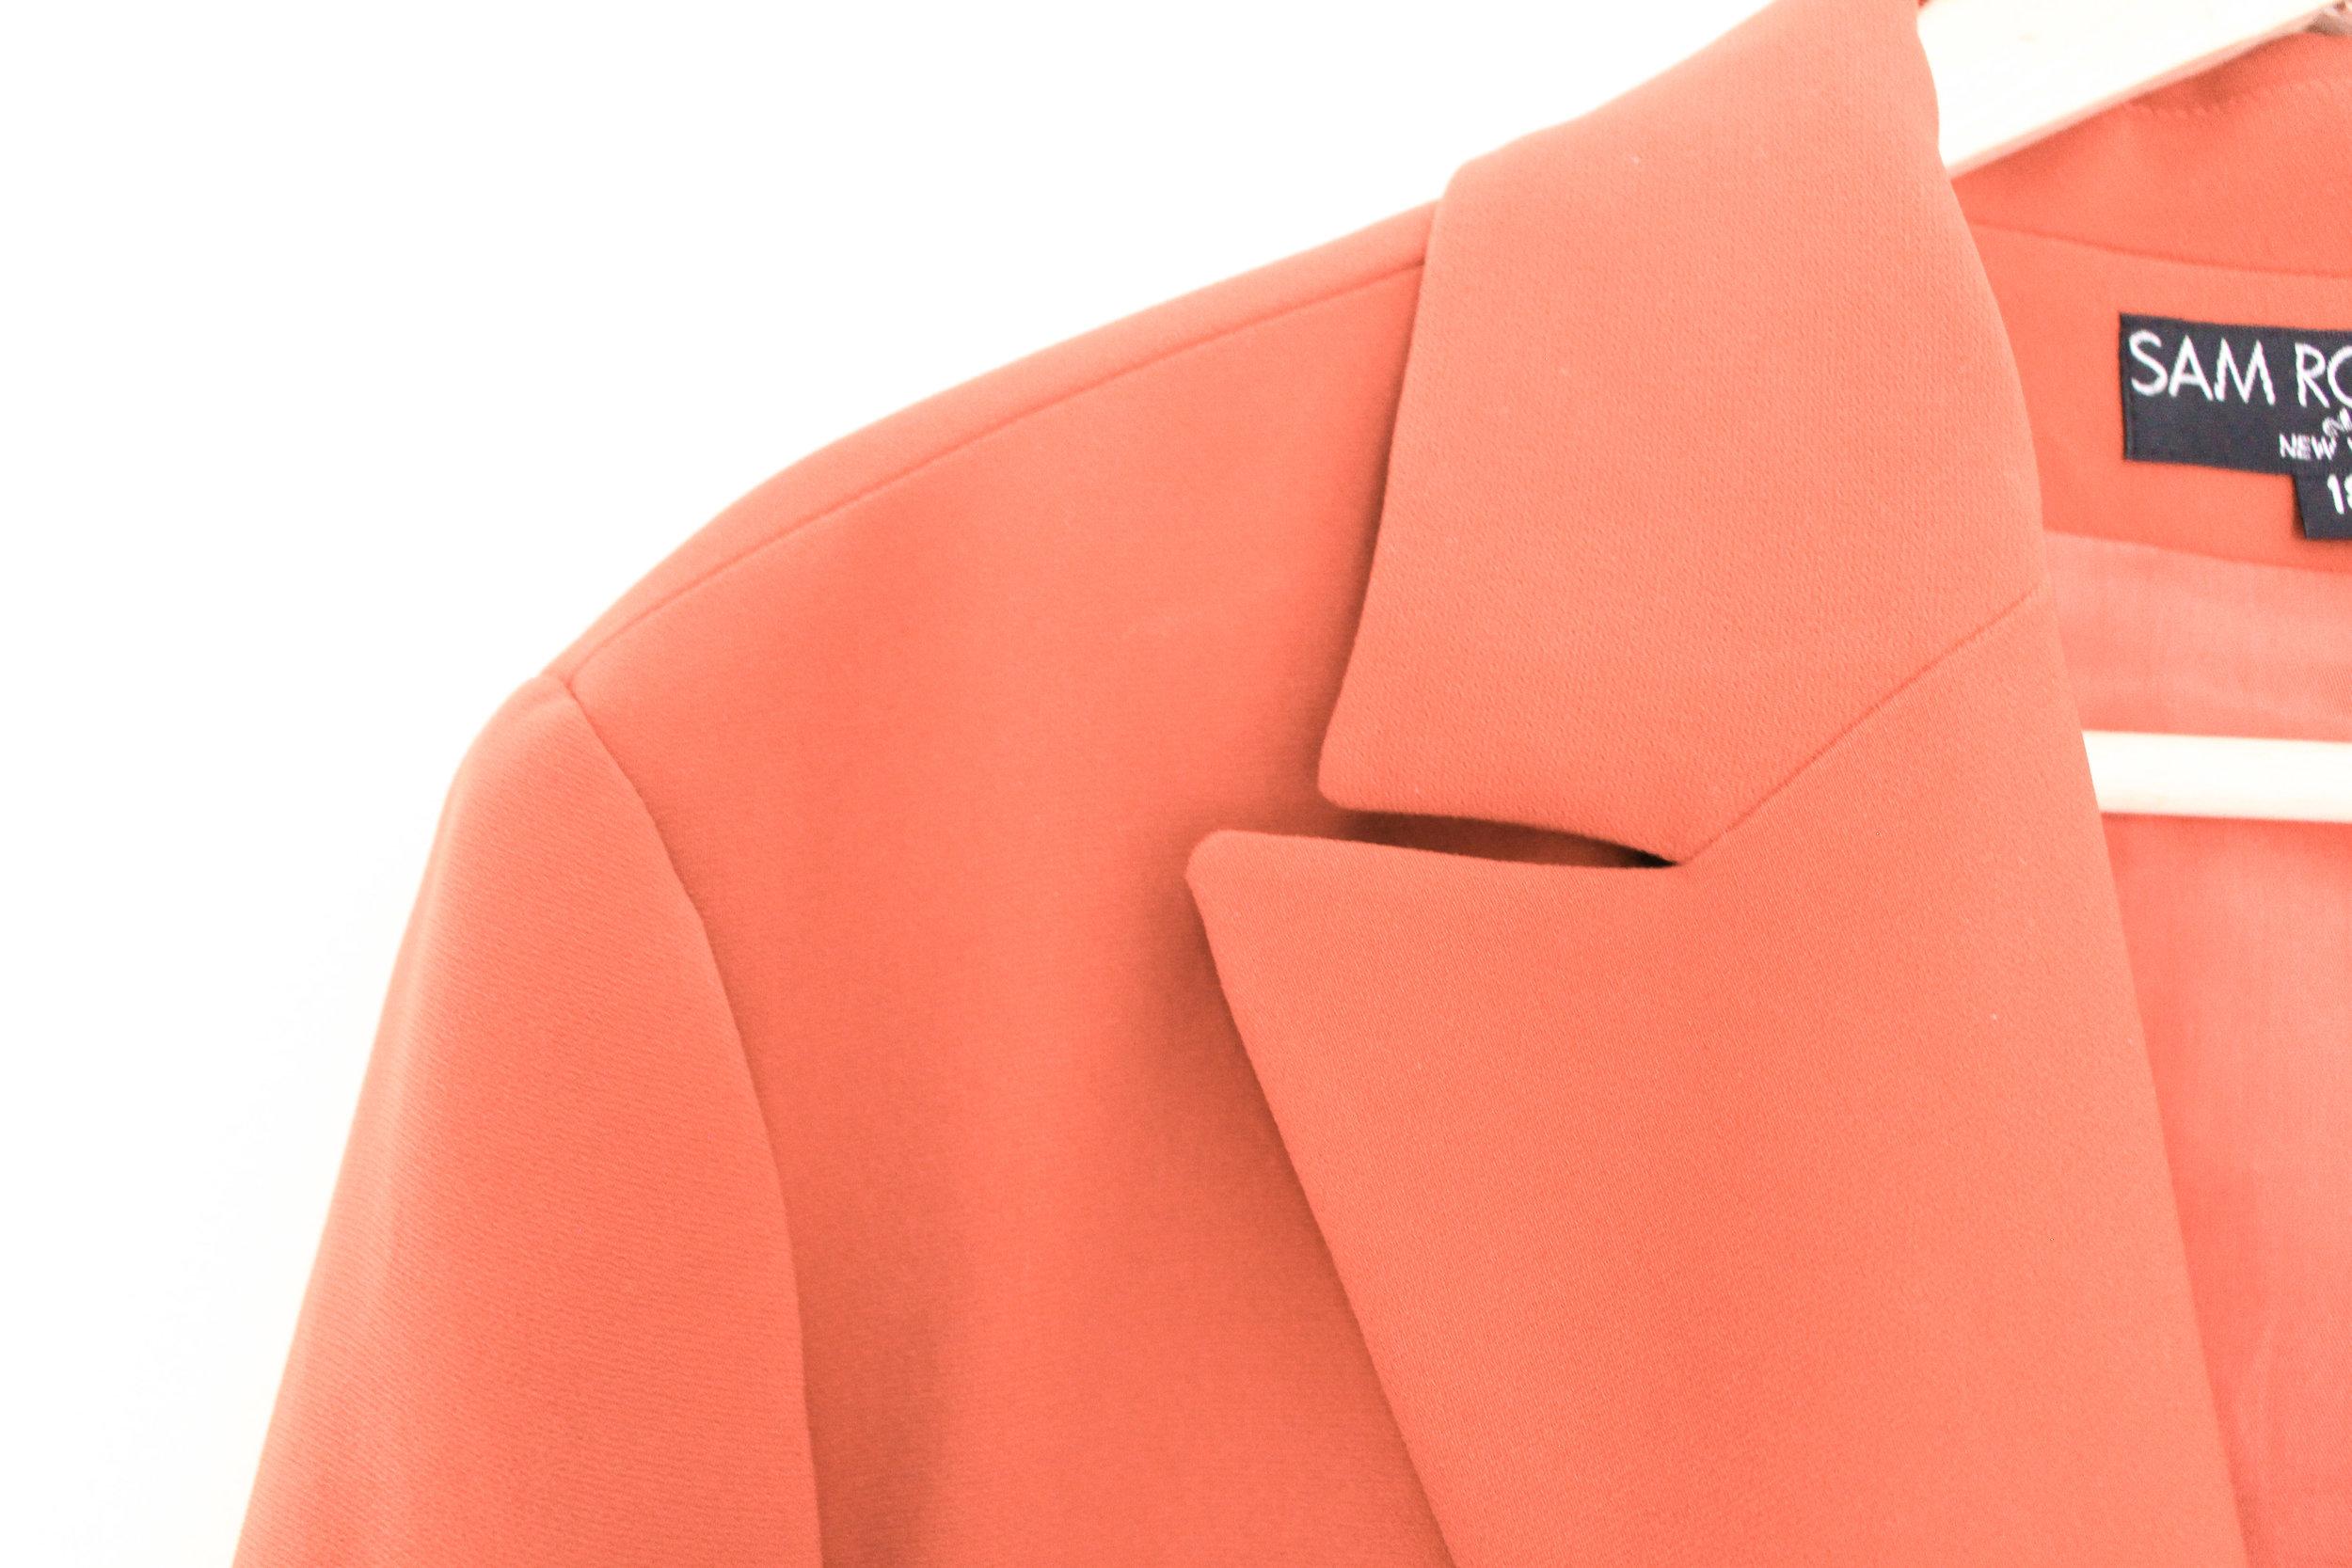 VOLD Fashion Vintage and Retro 90s Orange Blazer Review